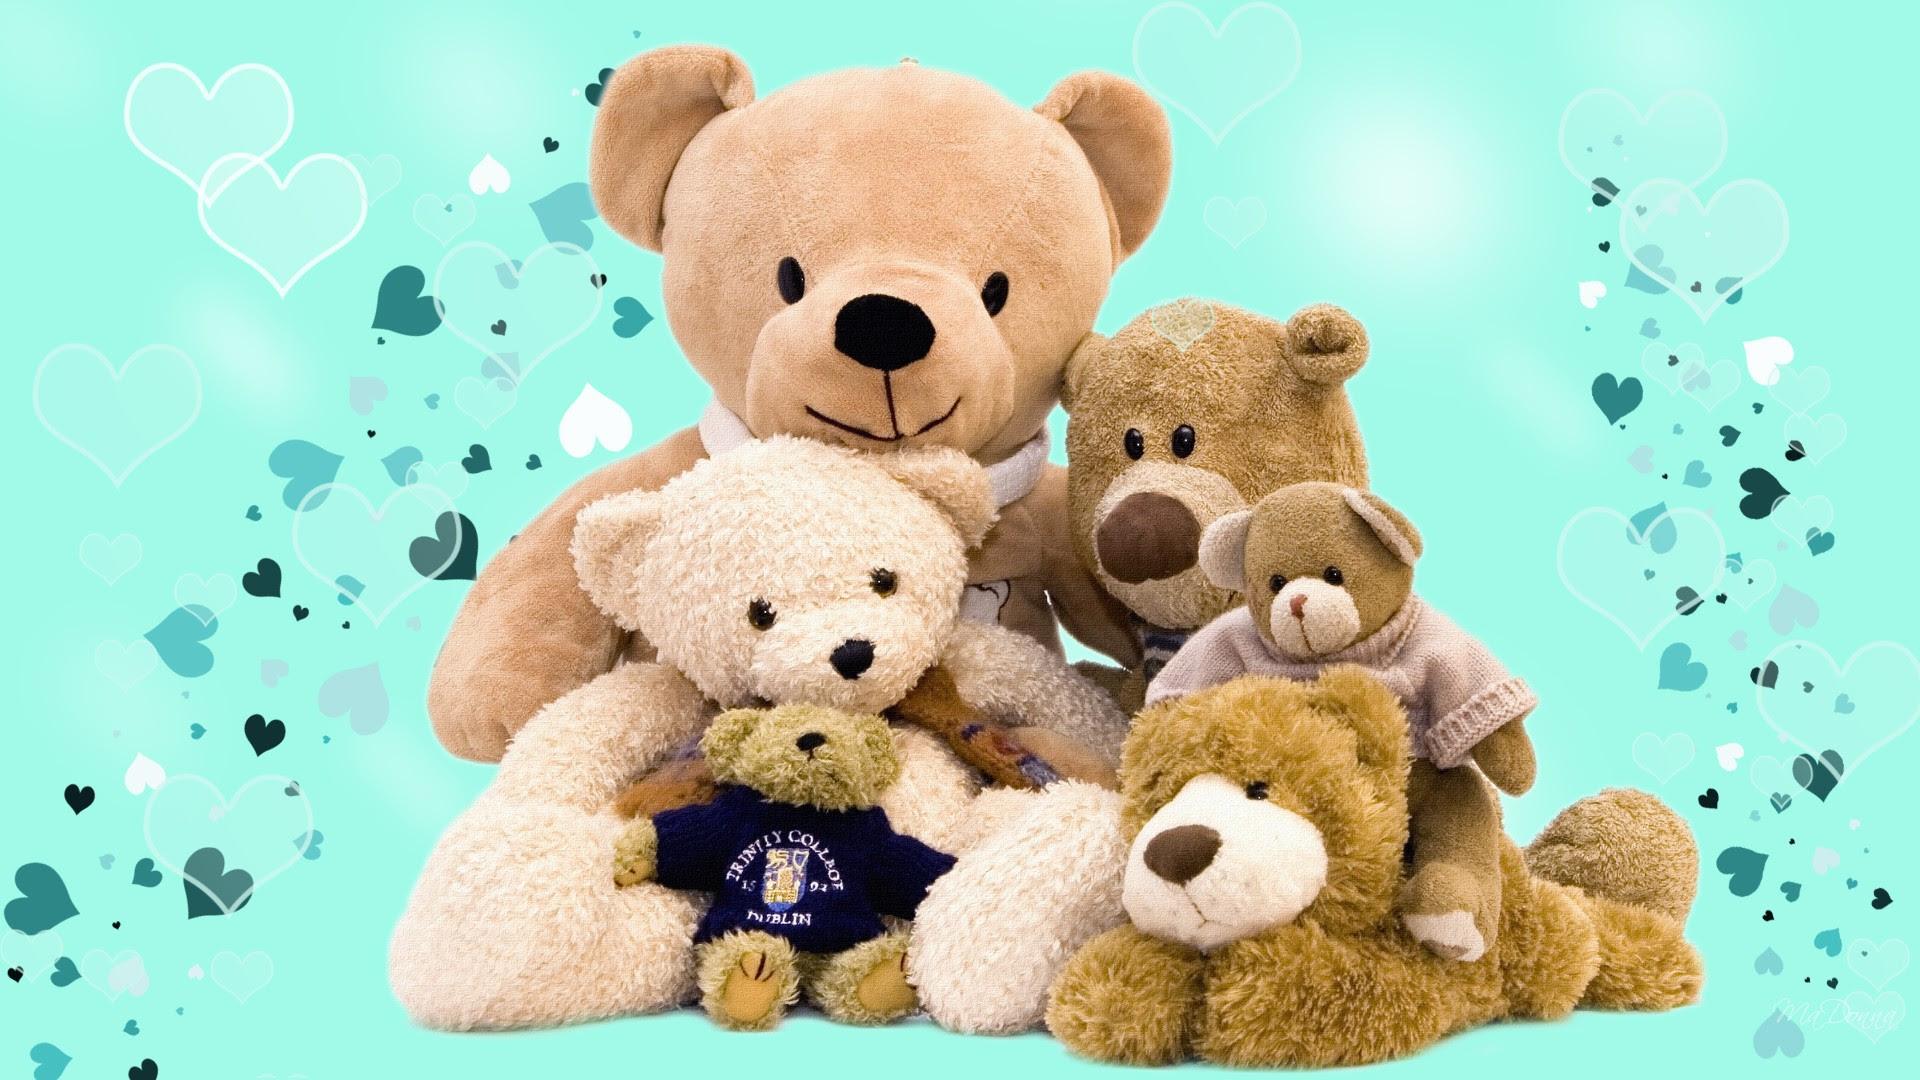 Cute Teddy Bear Wallpaper 1920x1080 55649